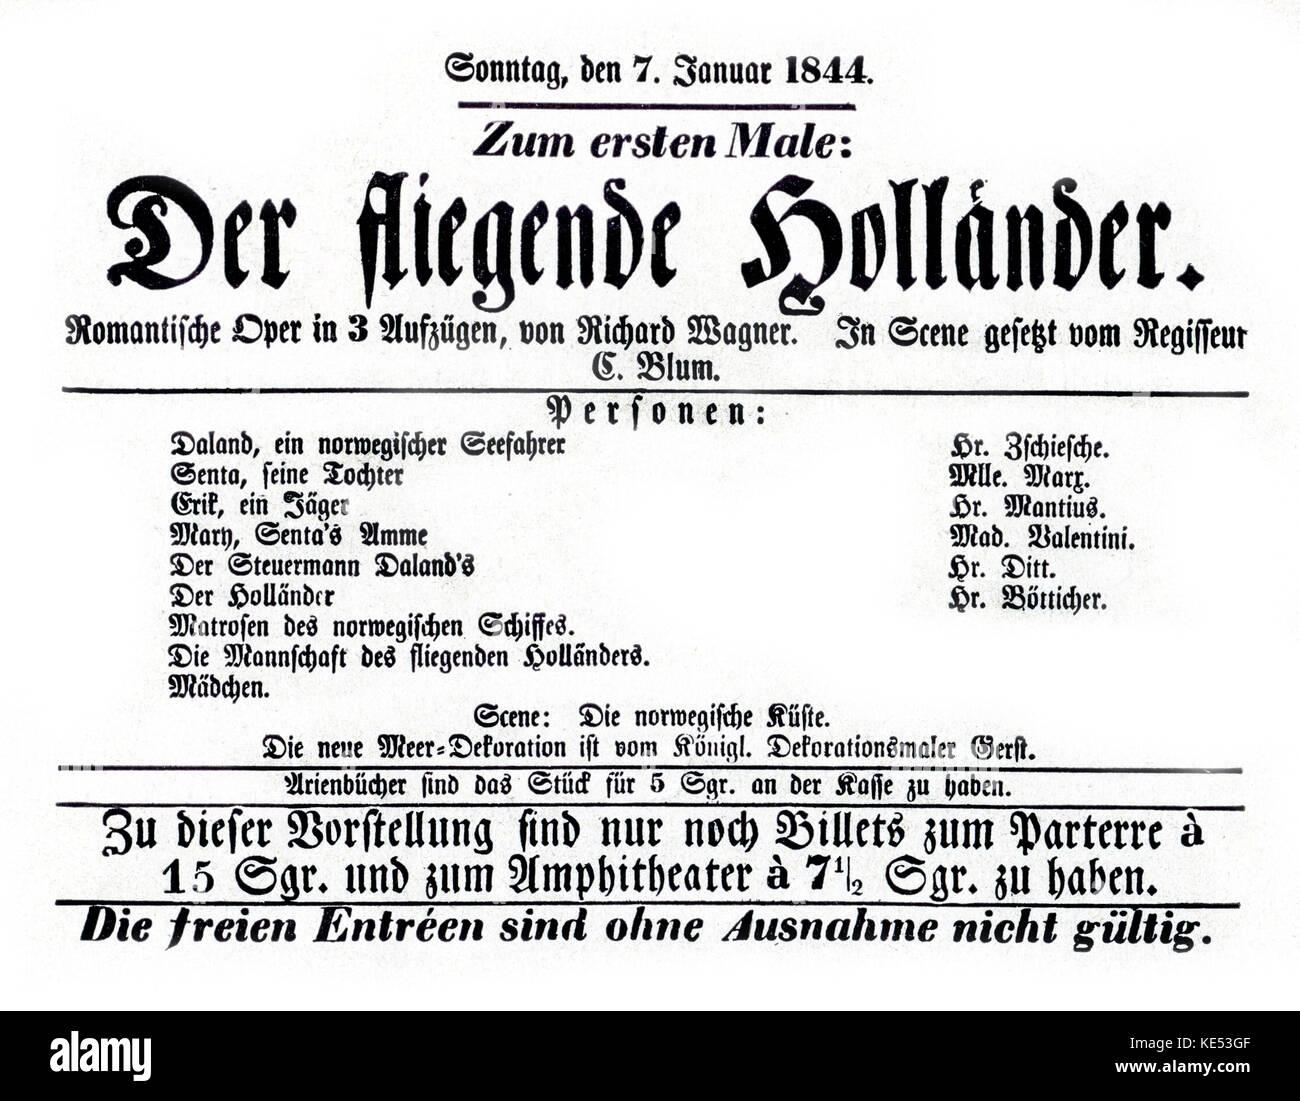 Flying Dutchman (Der fliegende Höllander) - opening night programme for the Berlin premiere on 7 January, 1844 - Stock Image